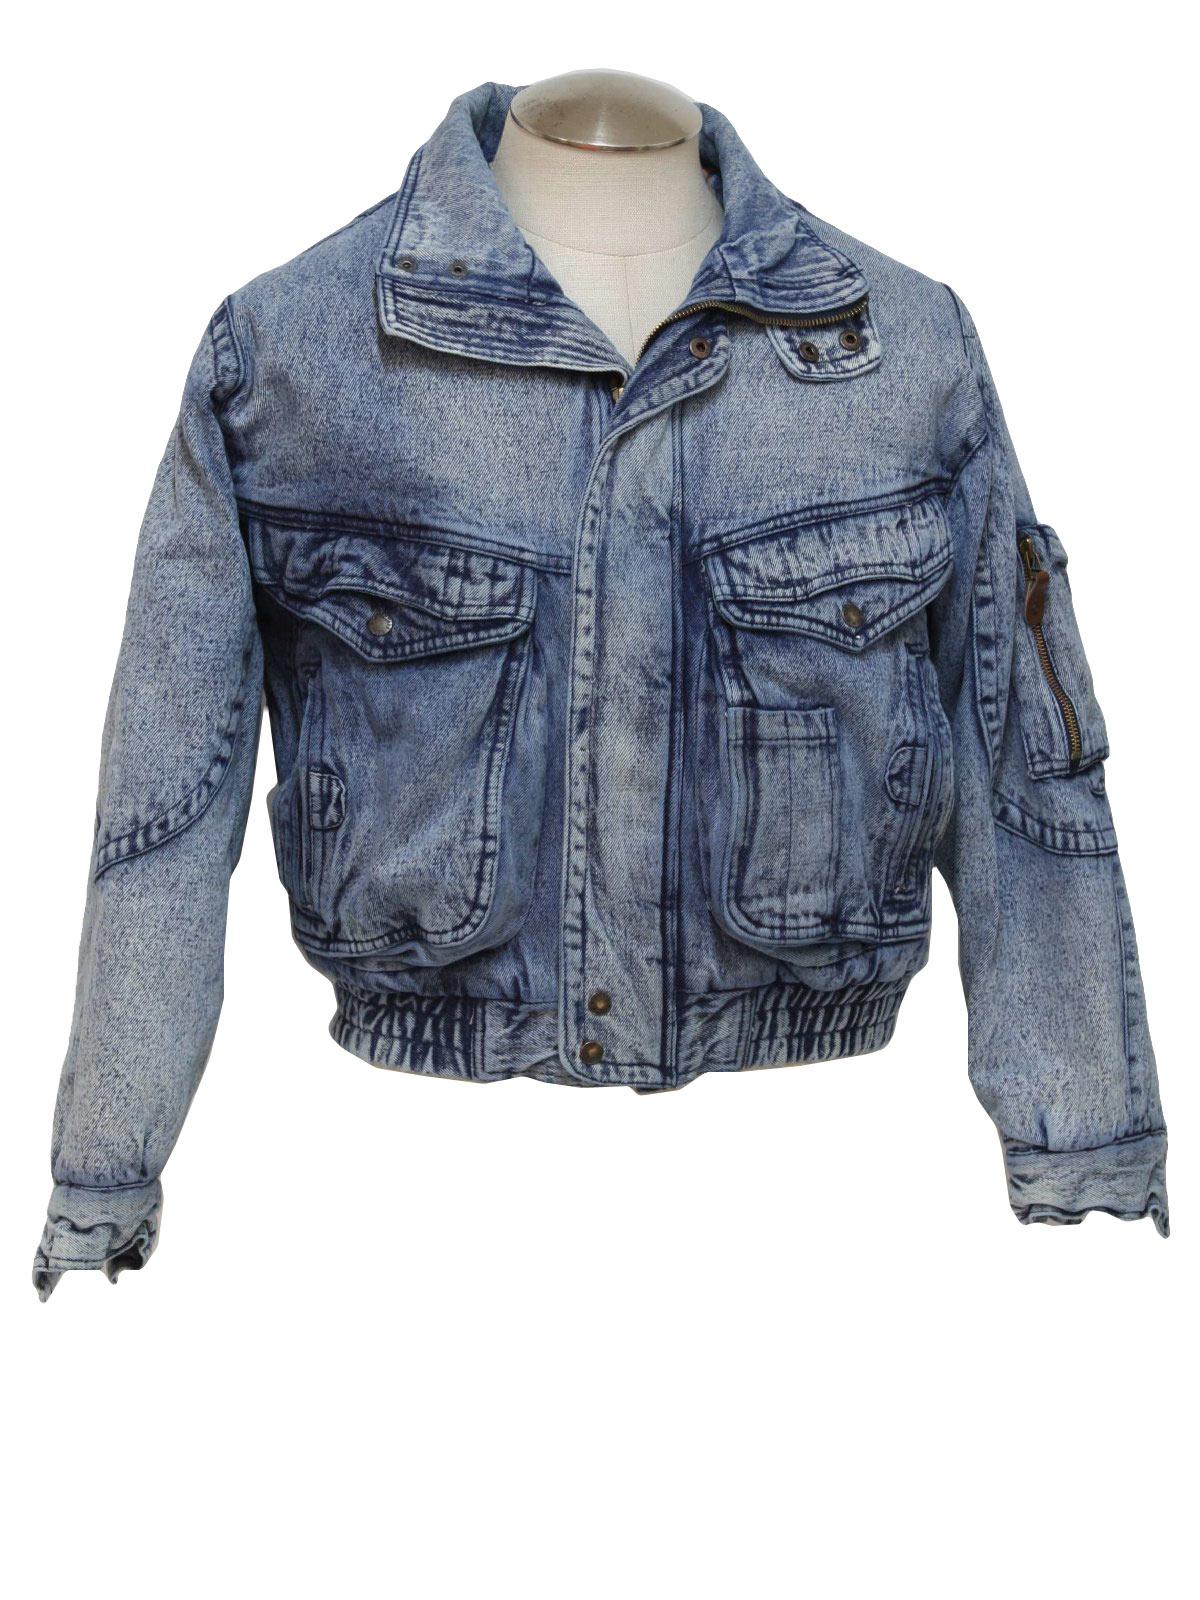 Retro 80 S Jacket 80s Todays News Mens Acid Washed Blue